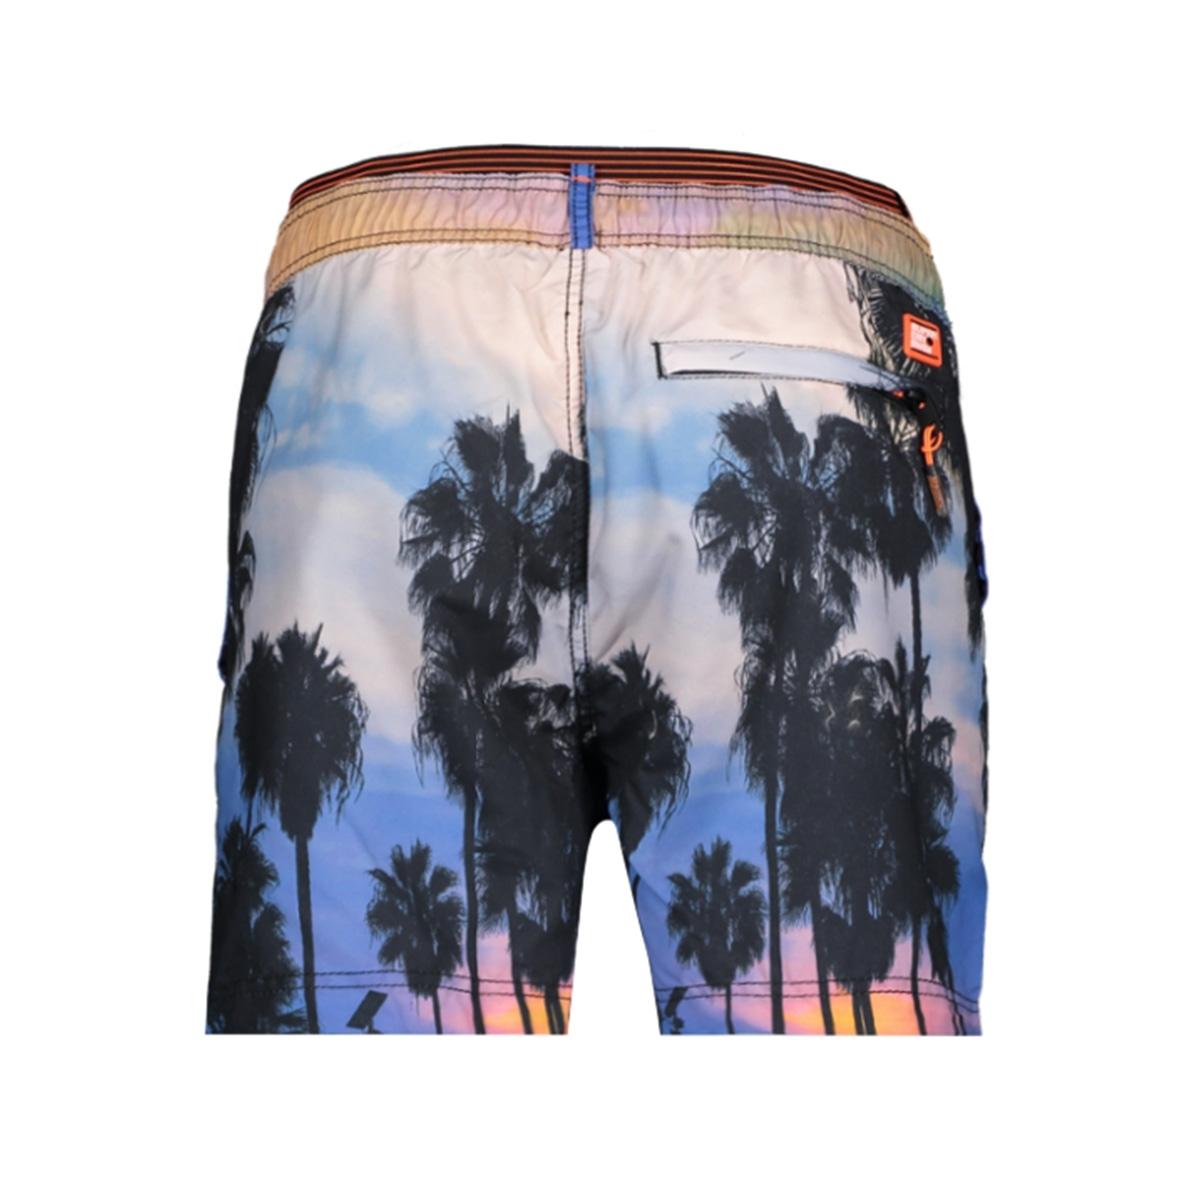 volley swim short m3010010a superdry korte broek skate palm